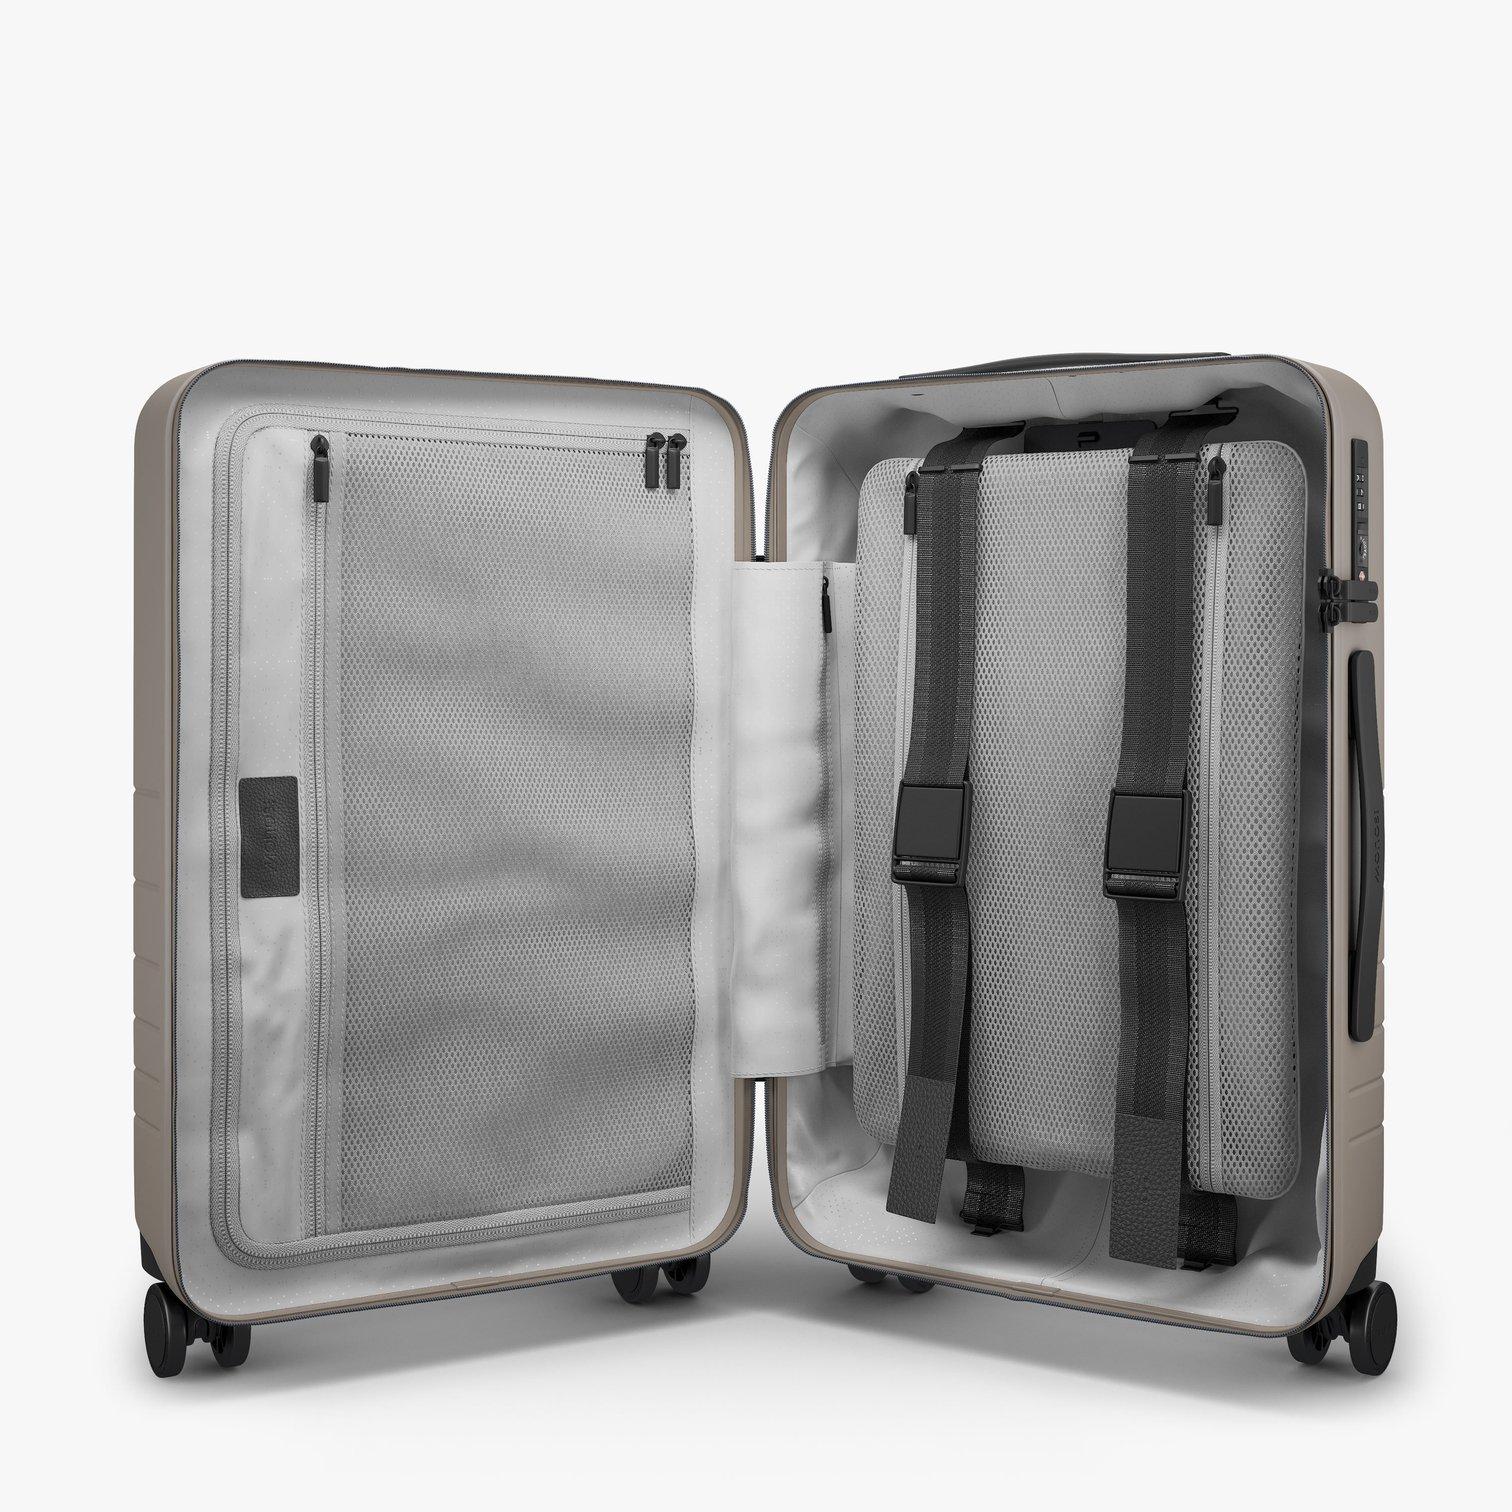 Monos suitcase review